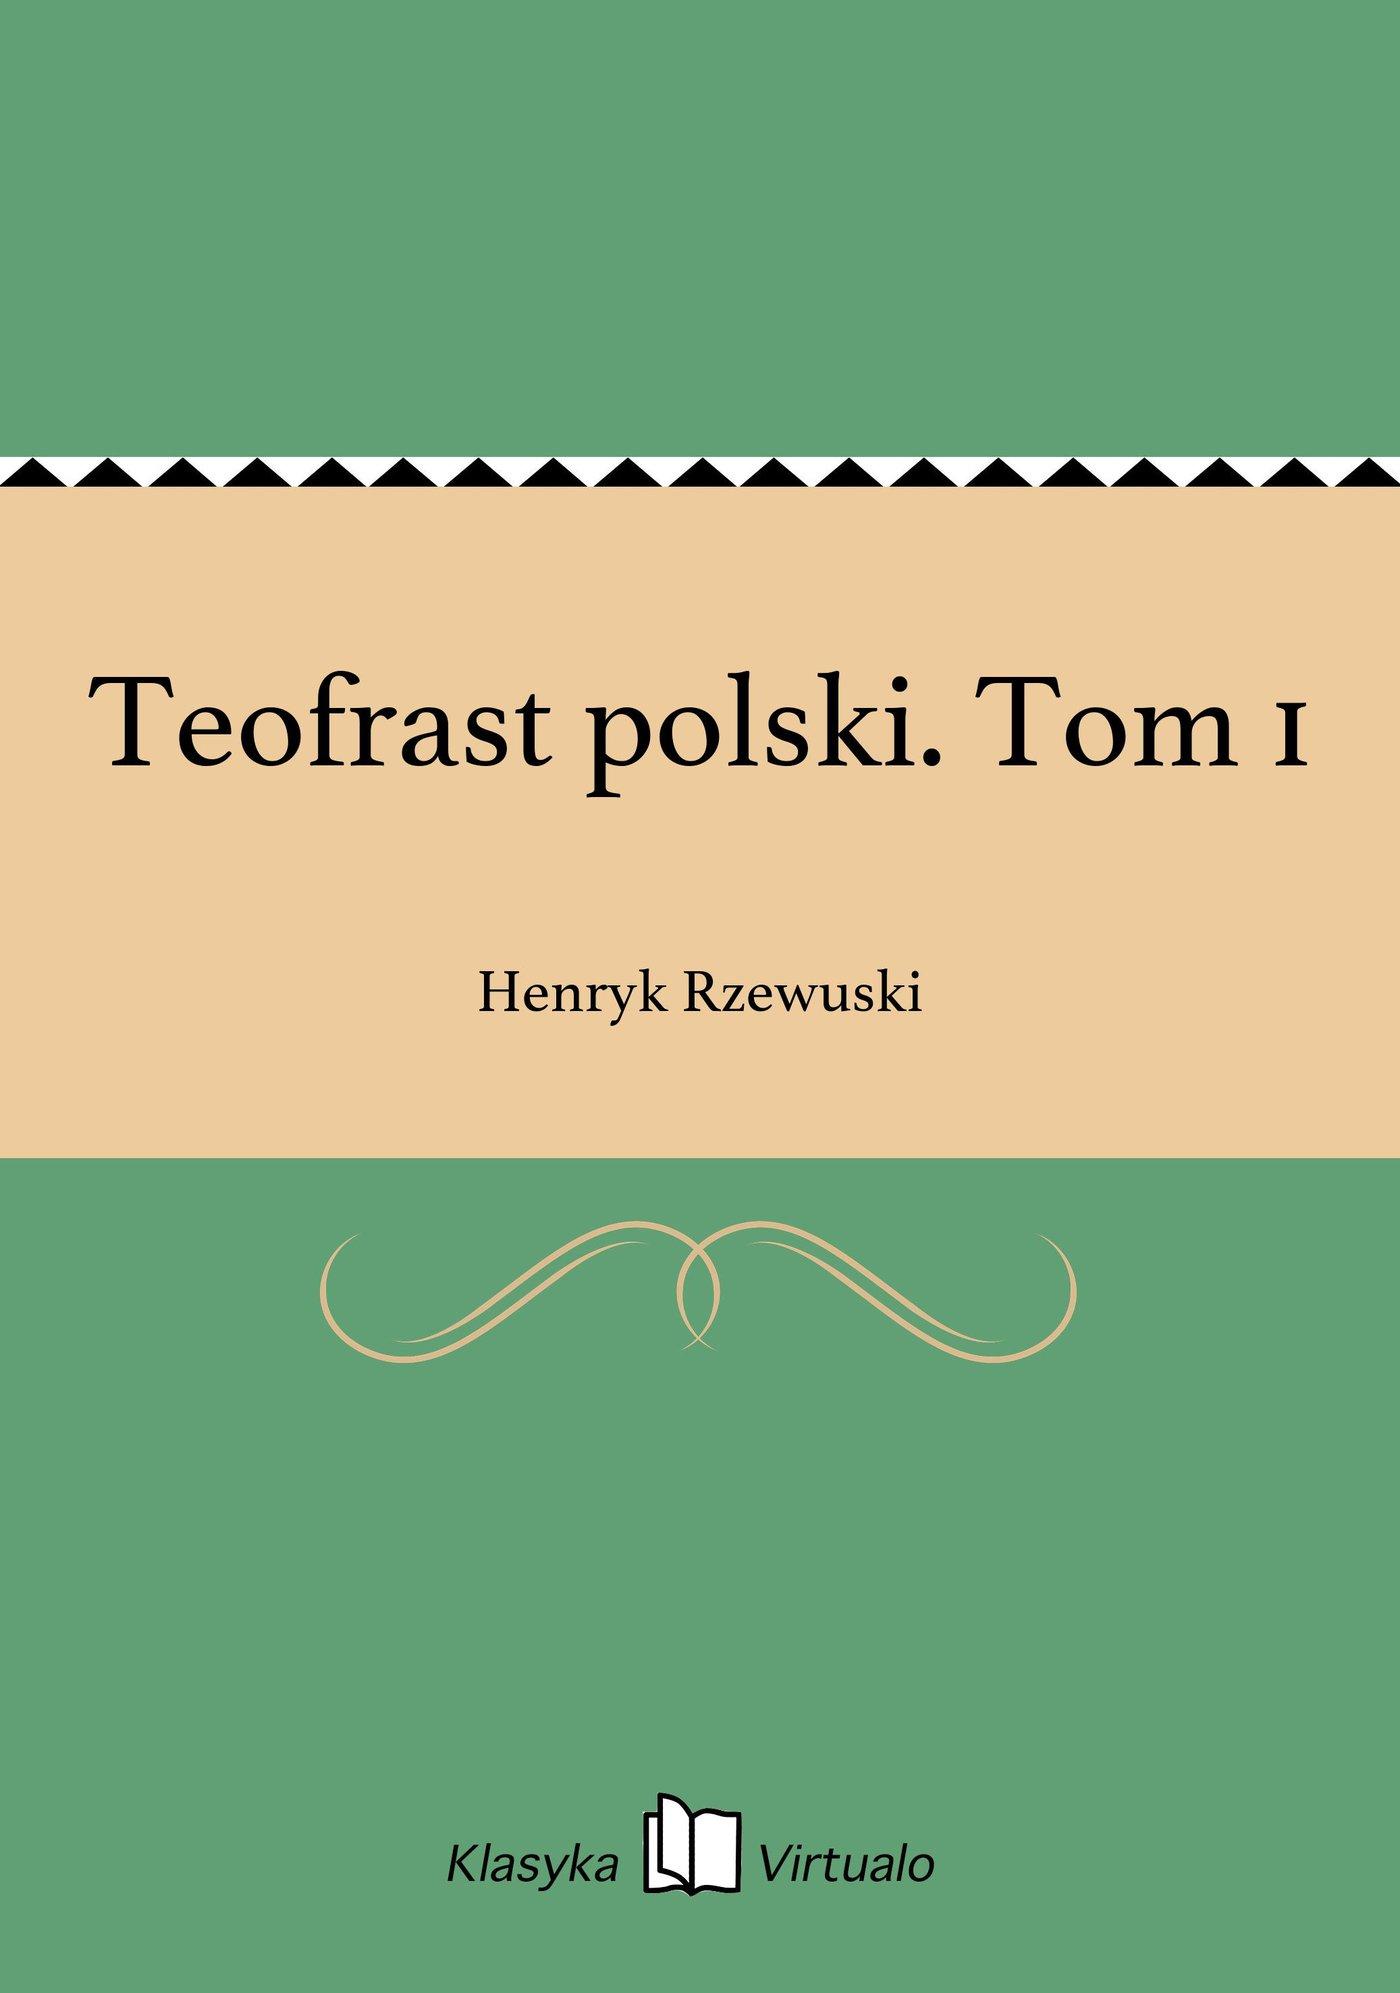 Teofrast polski. Tom 1 - Ebook (Książka na Kindle) do pobrania w formacie MOBI